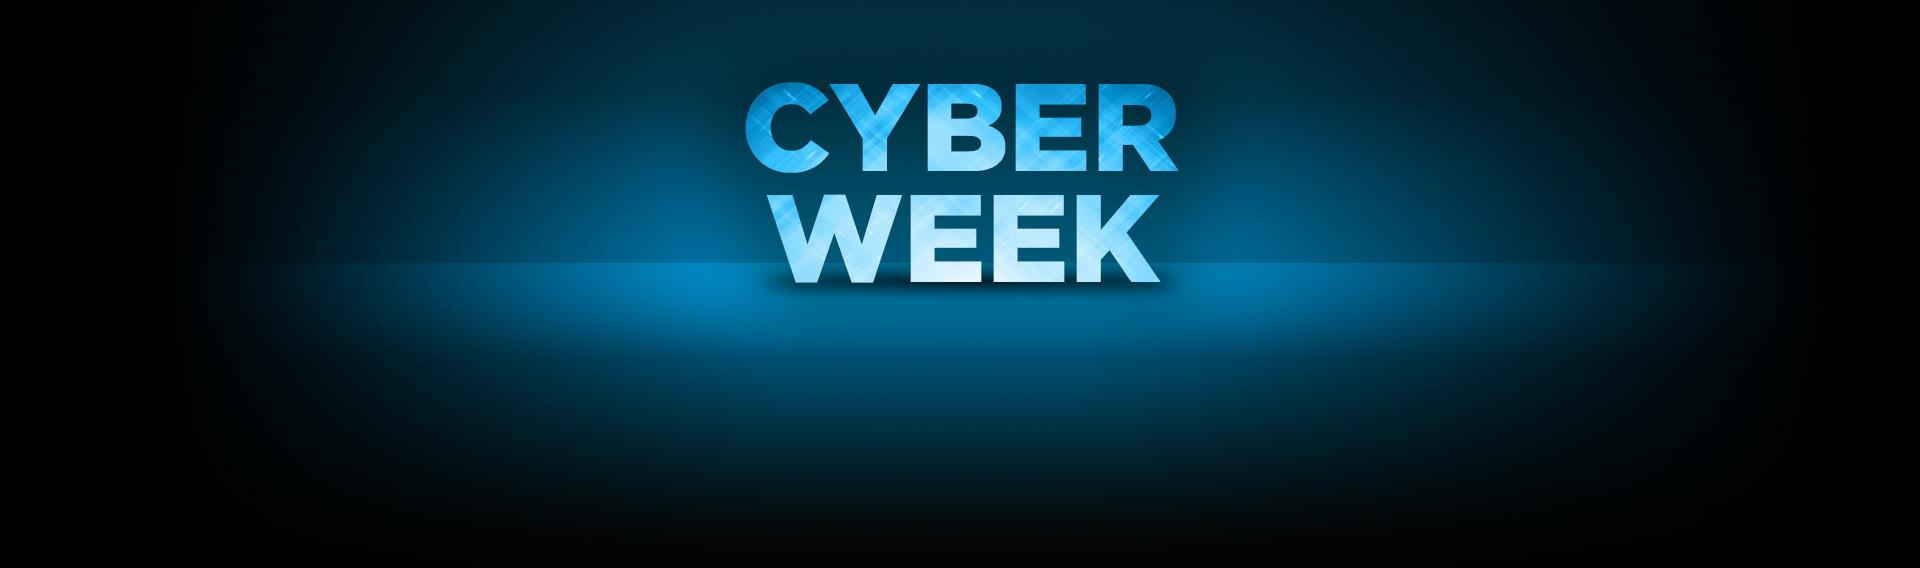 Cyber Week. 12 cuotas sin interés